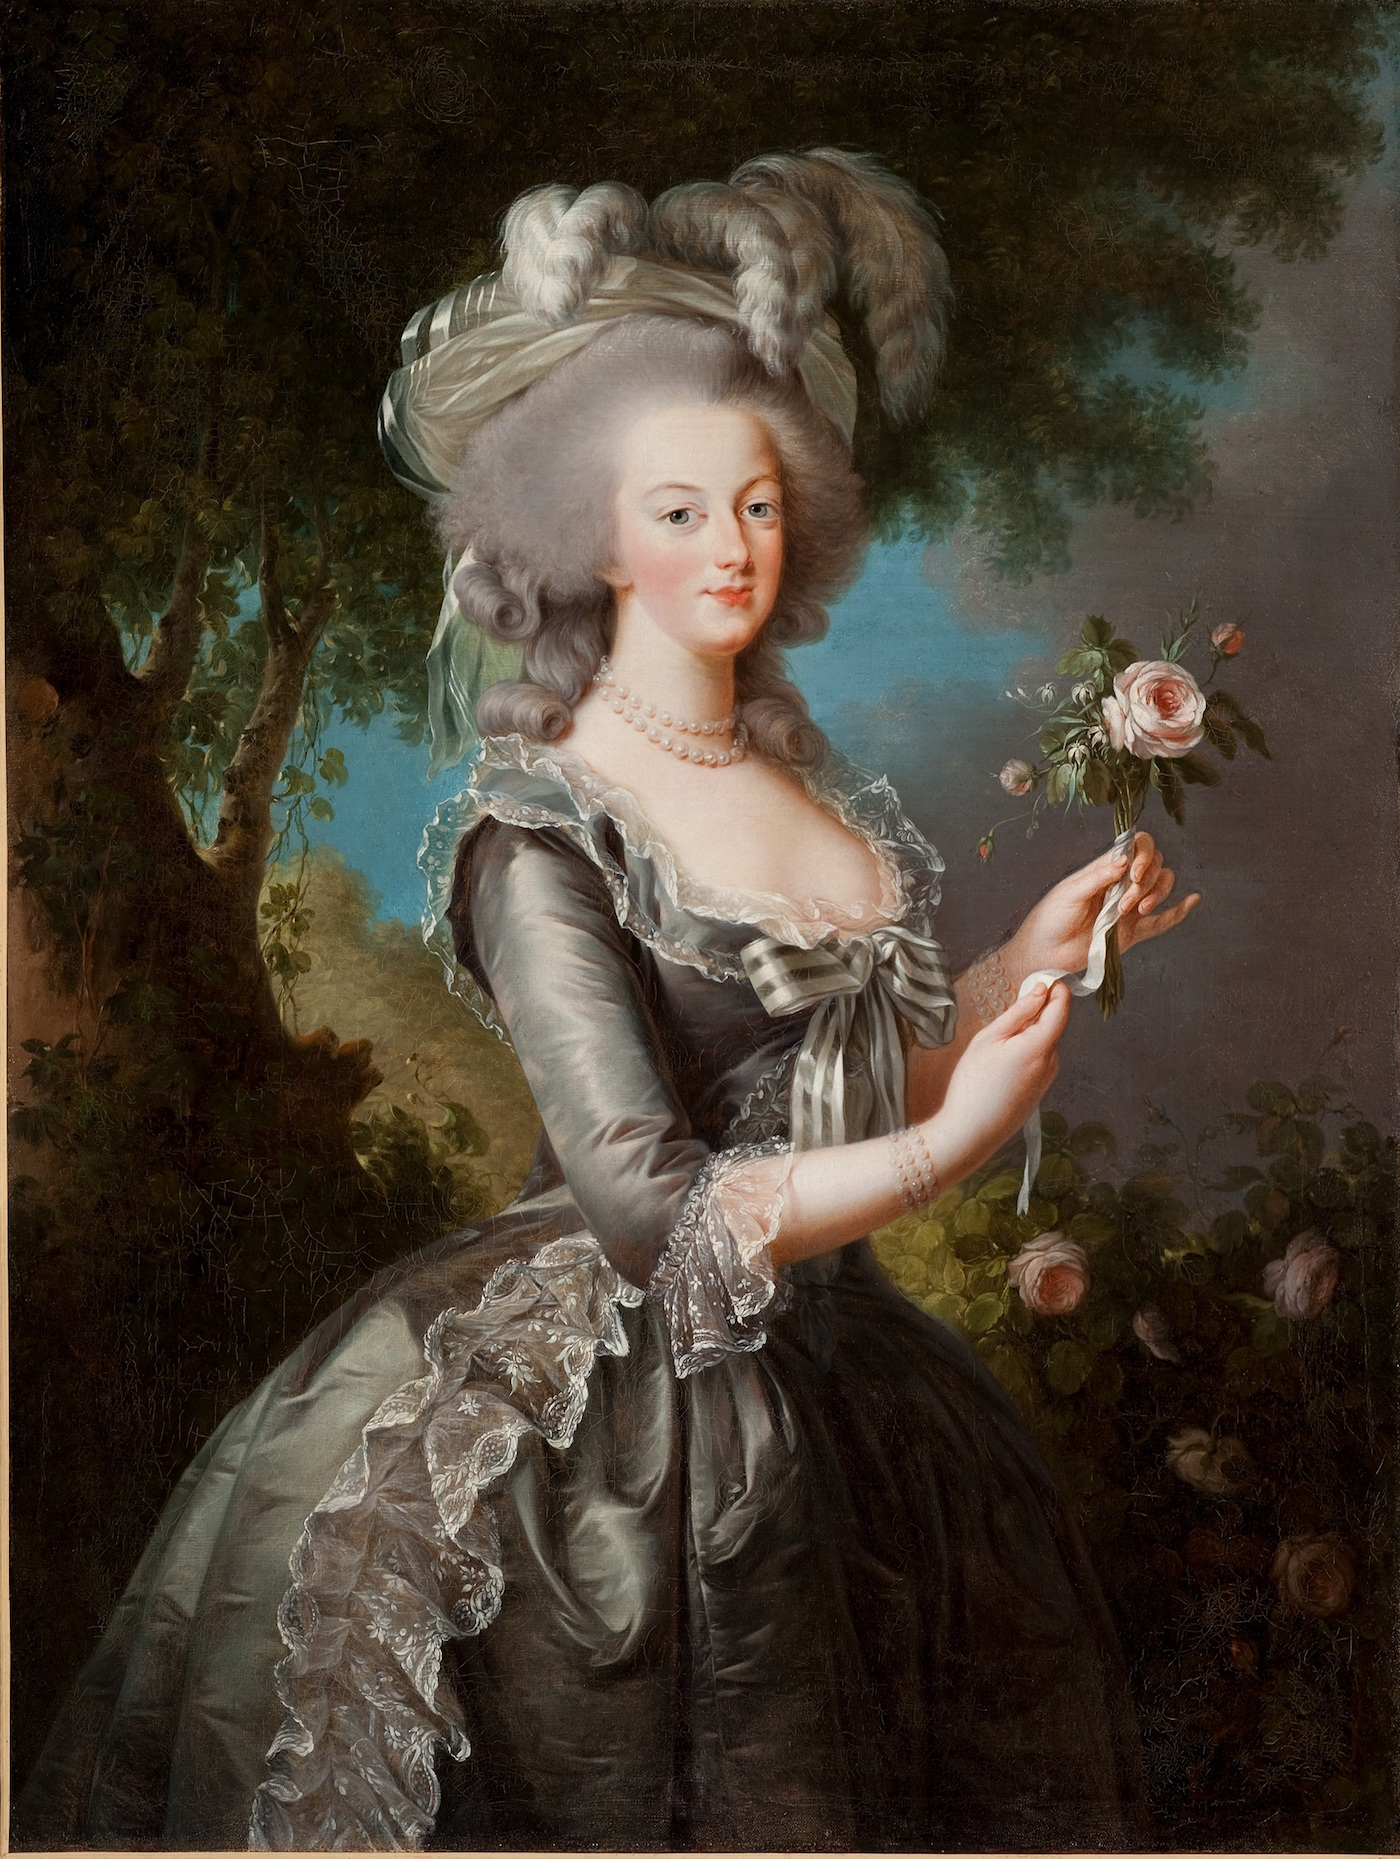 La regina Marie Antoinette